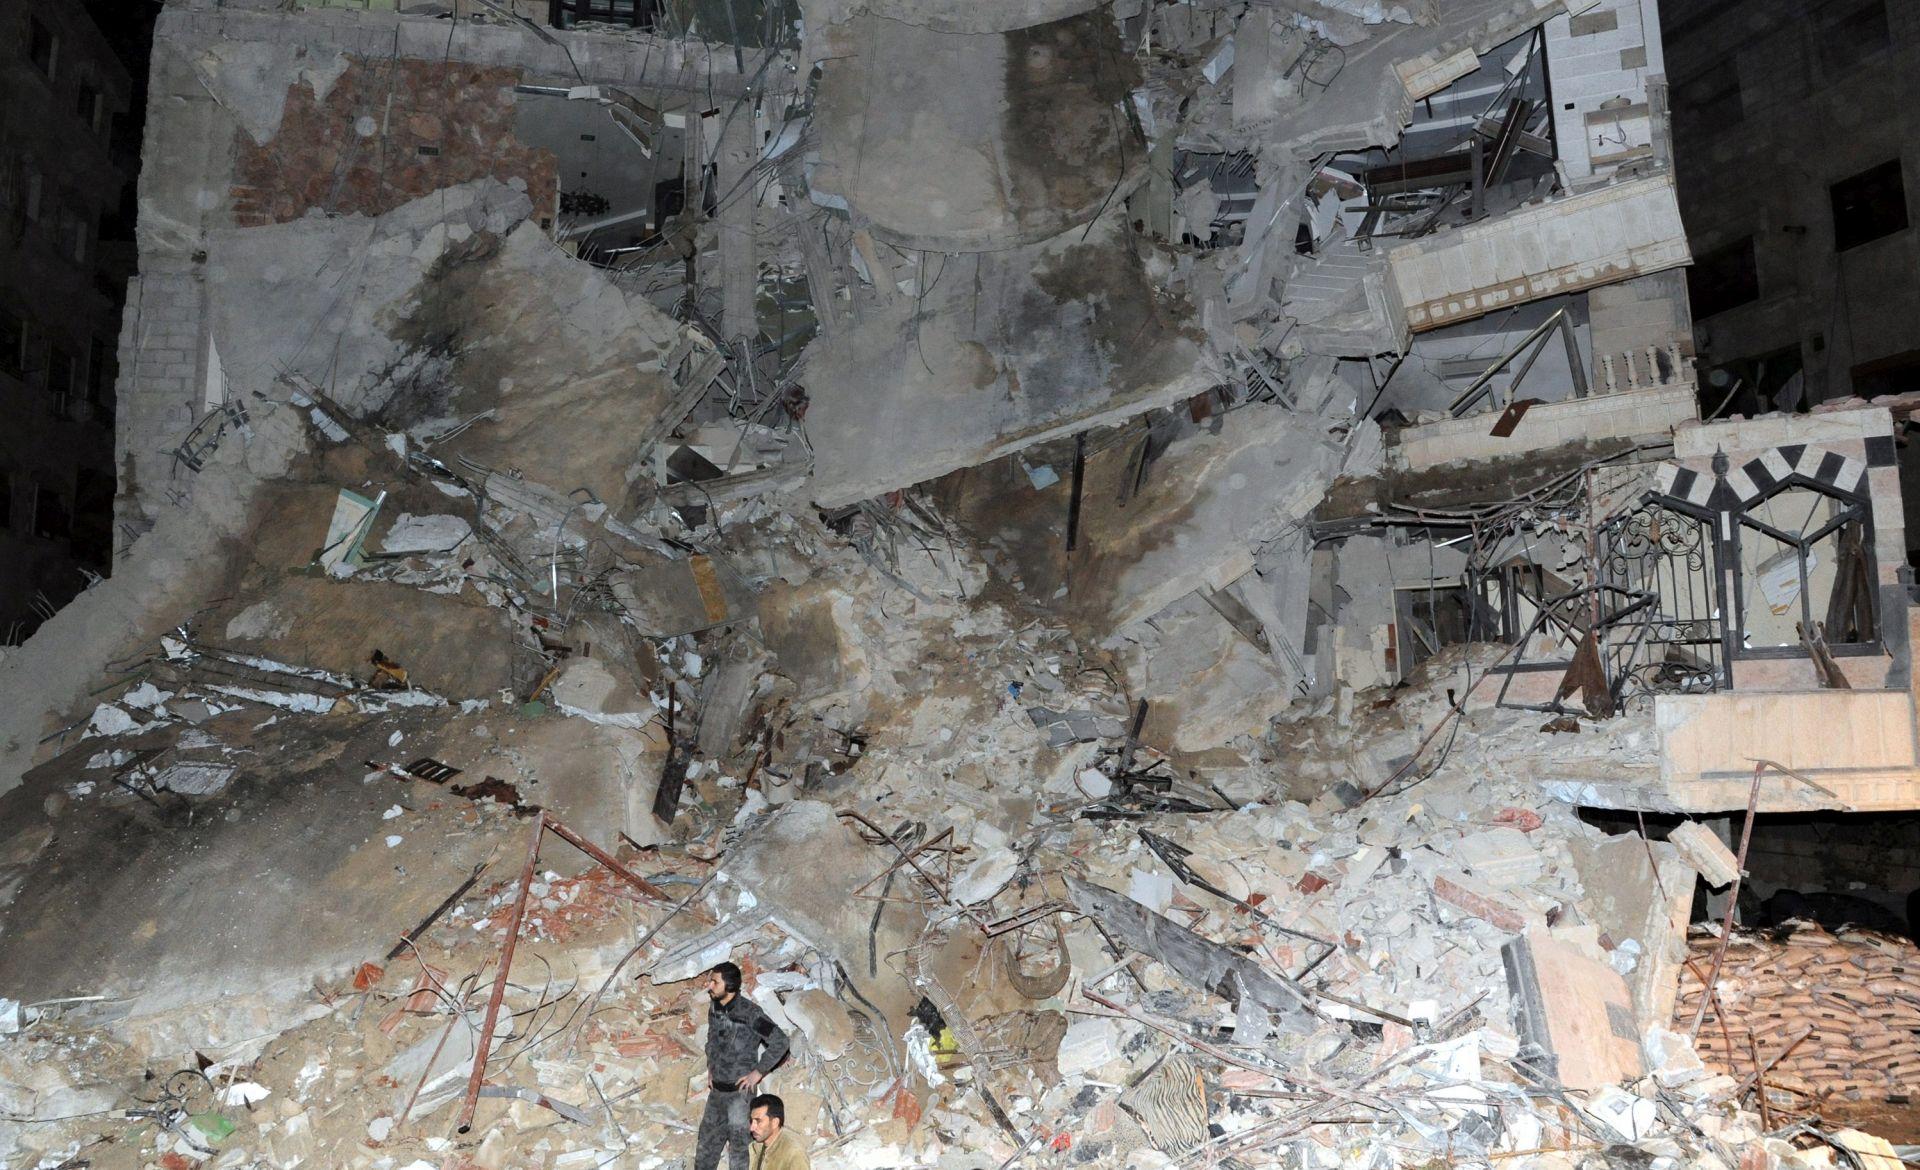 Istraga UN-a: Sirijska vlada i Islamska država počinile zločine protiv čovječnosti